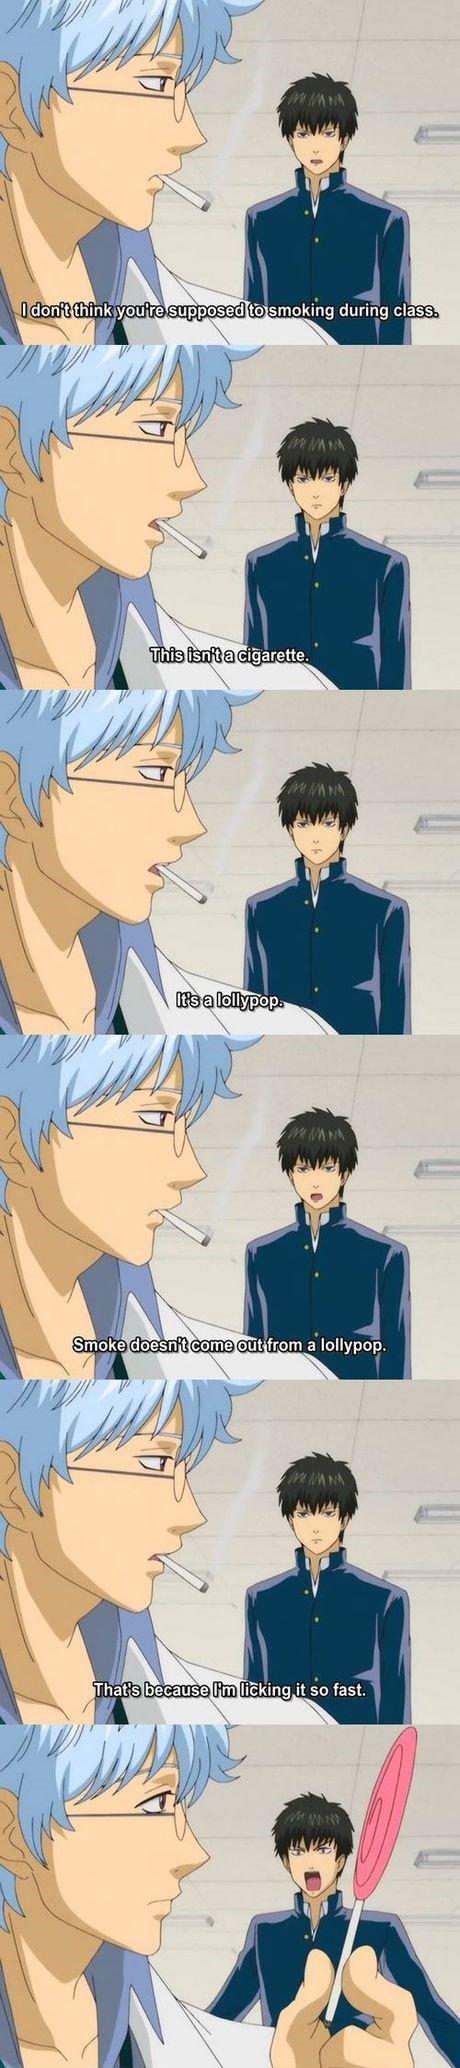 No smok- oh. Source: Gintama. No smok- oh Source: Gintama